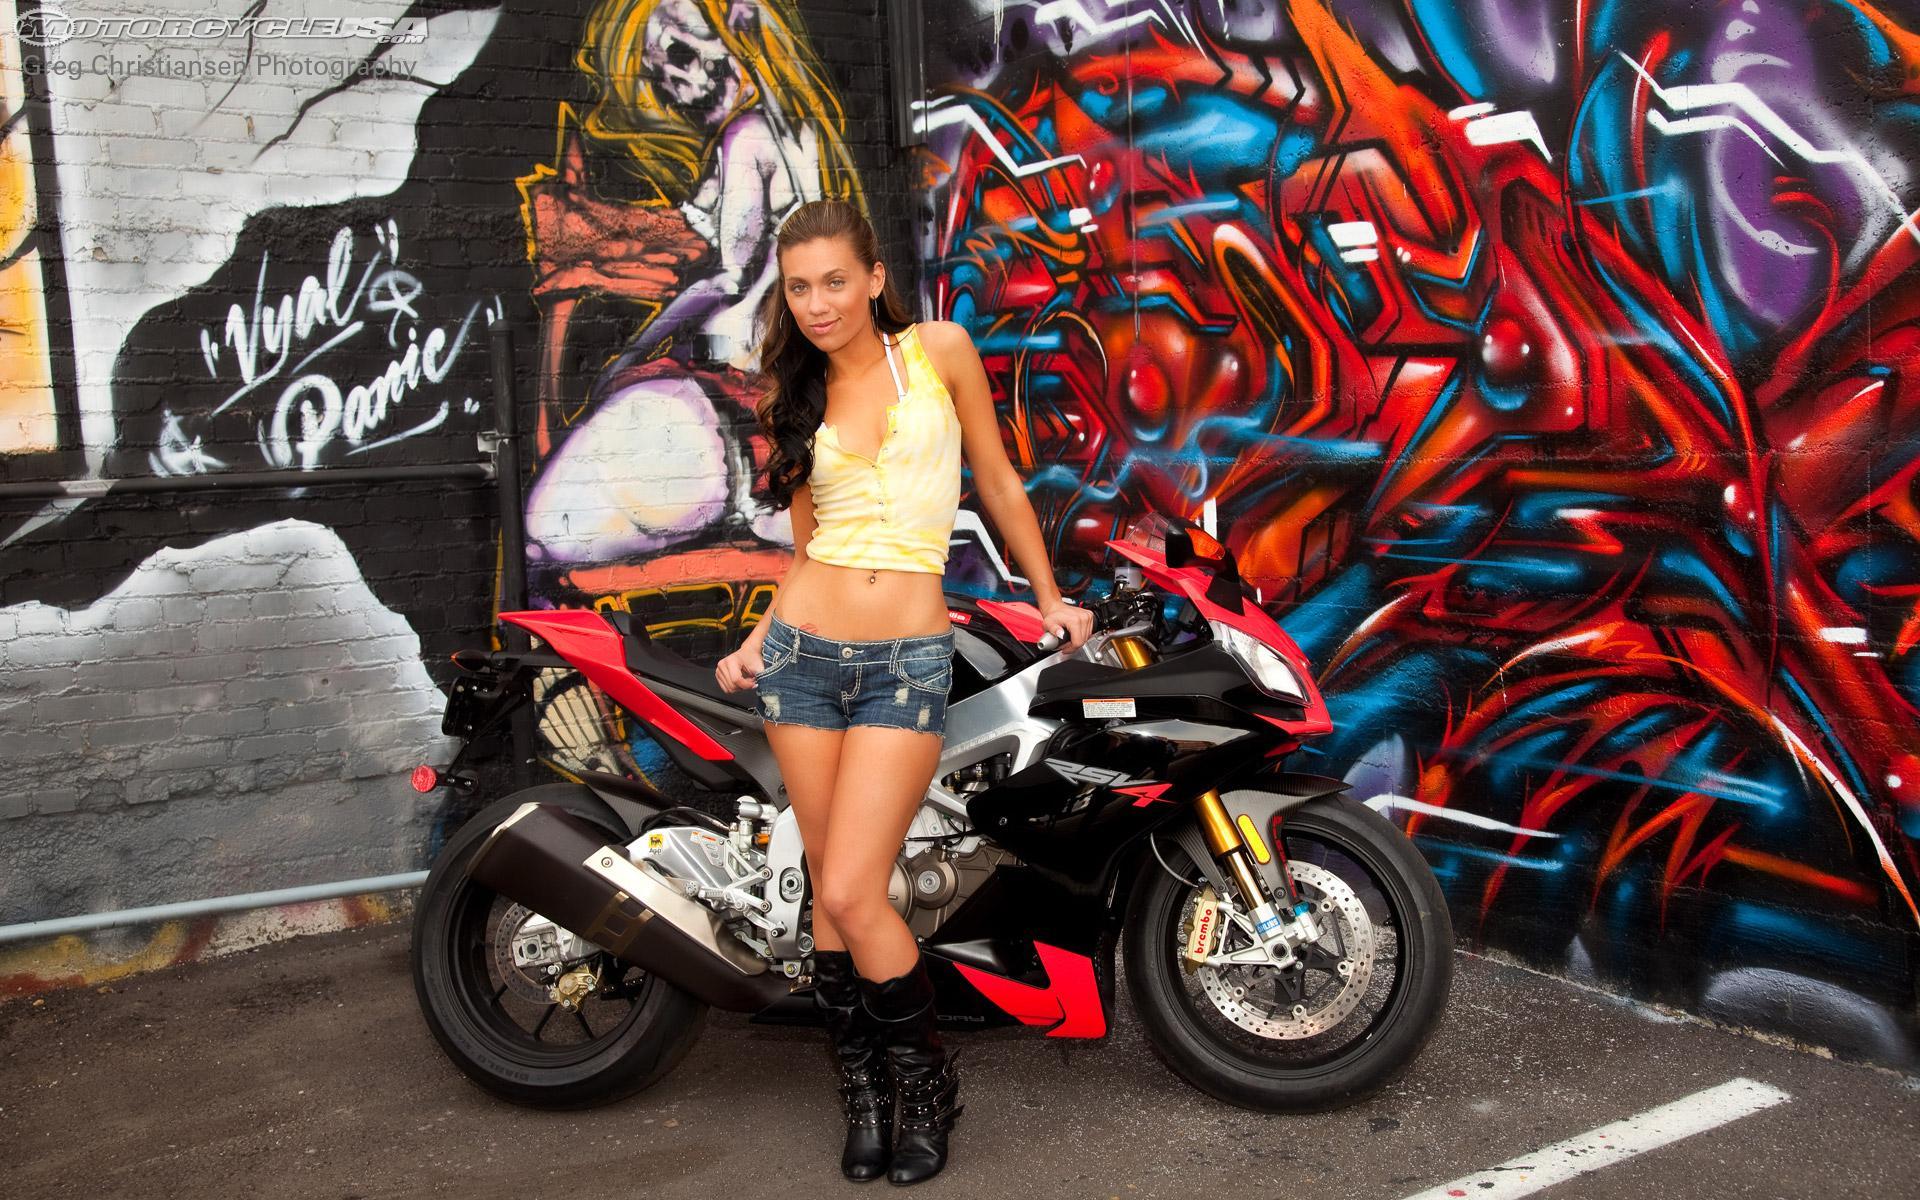 Motorcycles images HOT BABE APRILIA RSV4 wallpaper photos 31778288 1920x1200